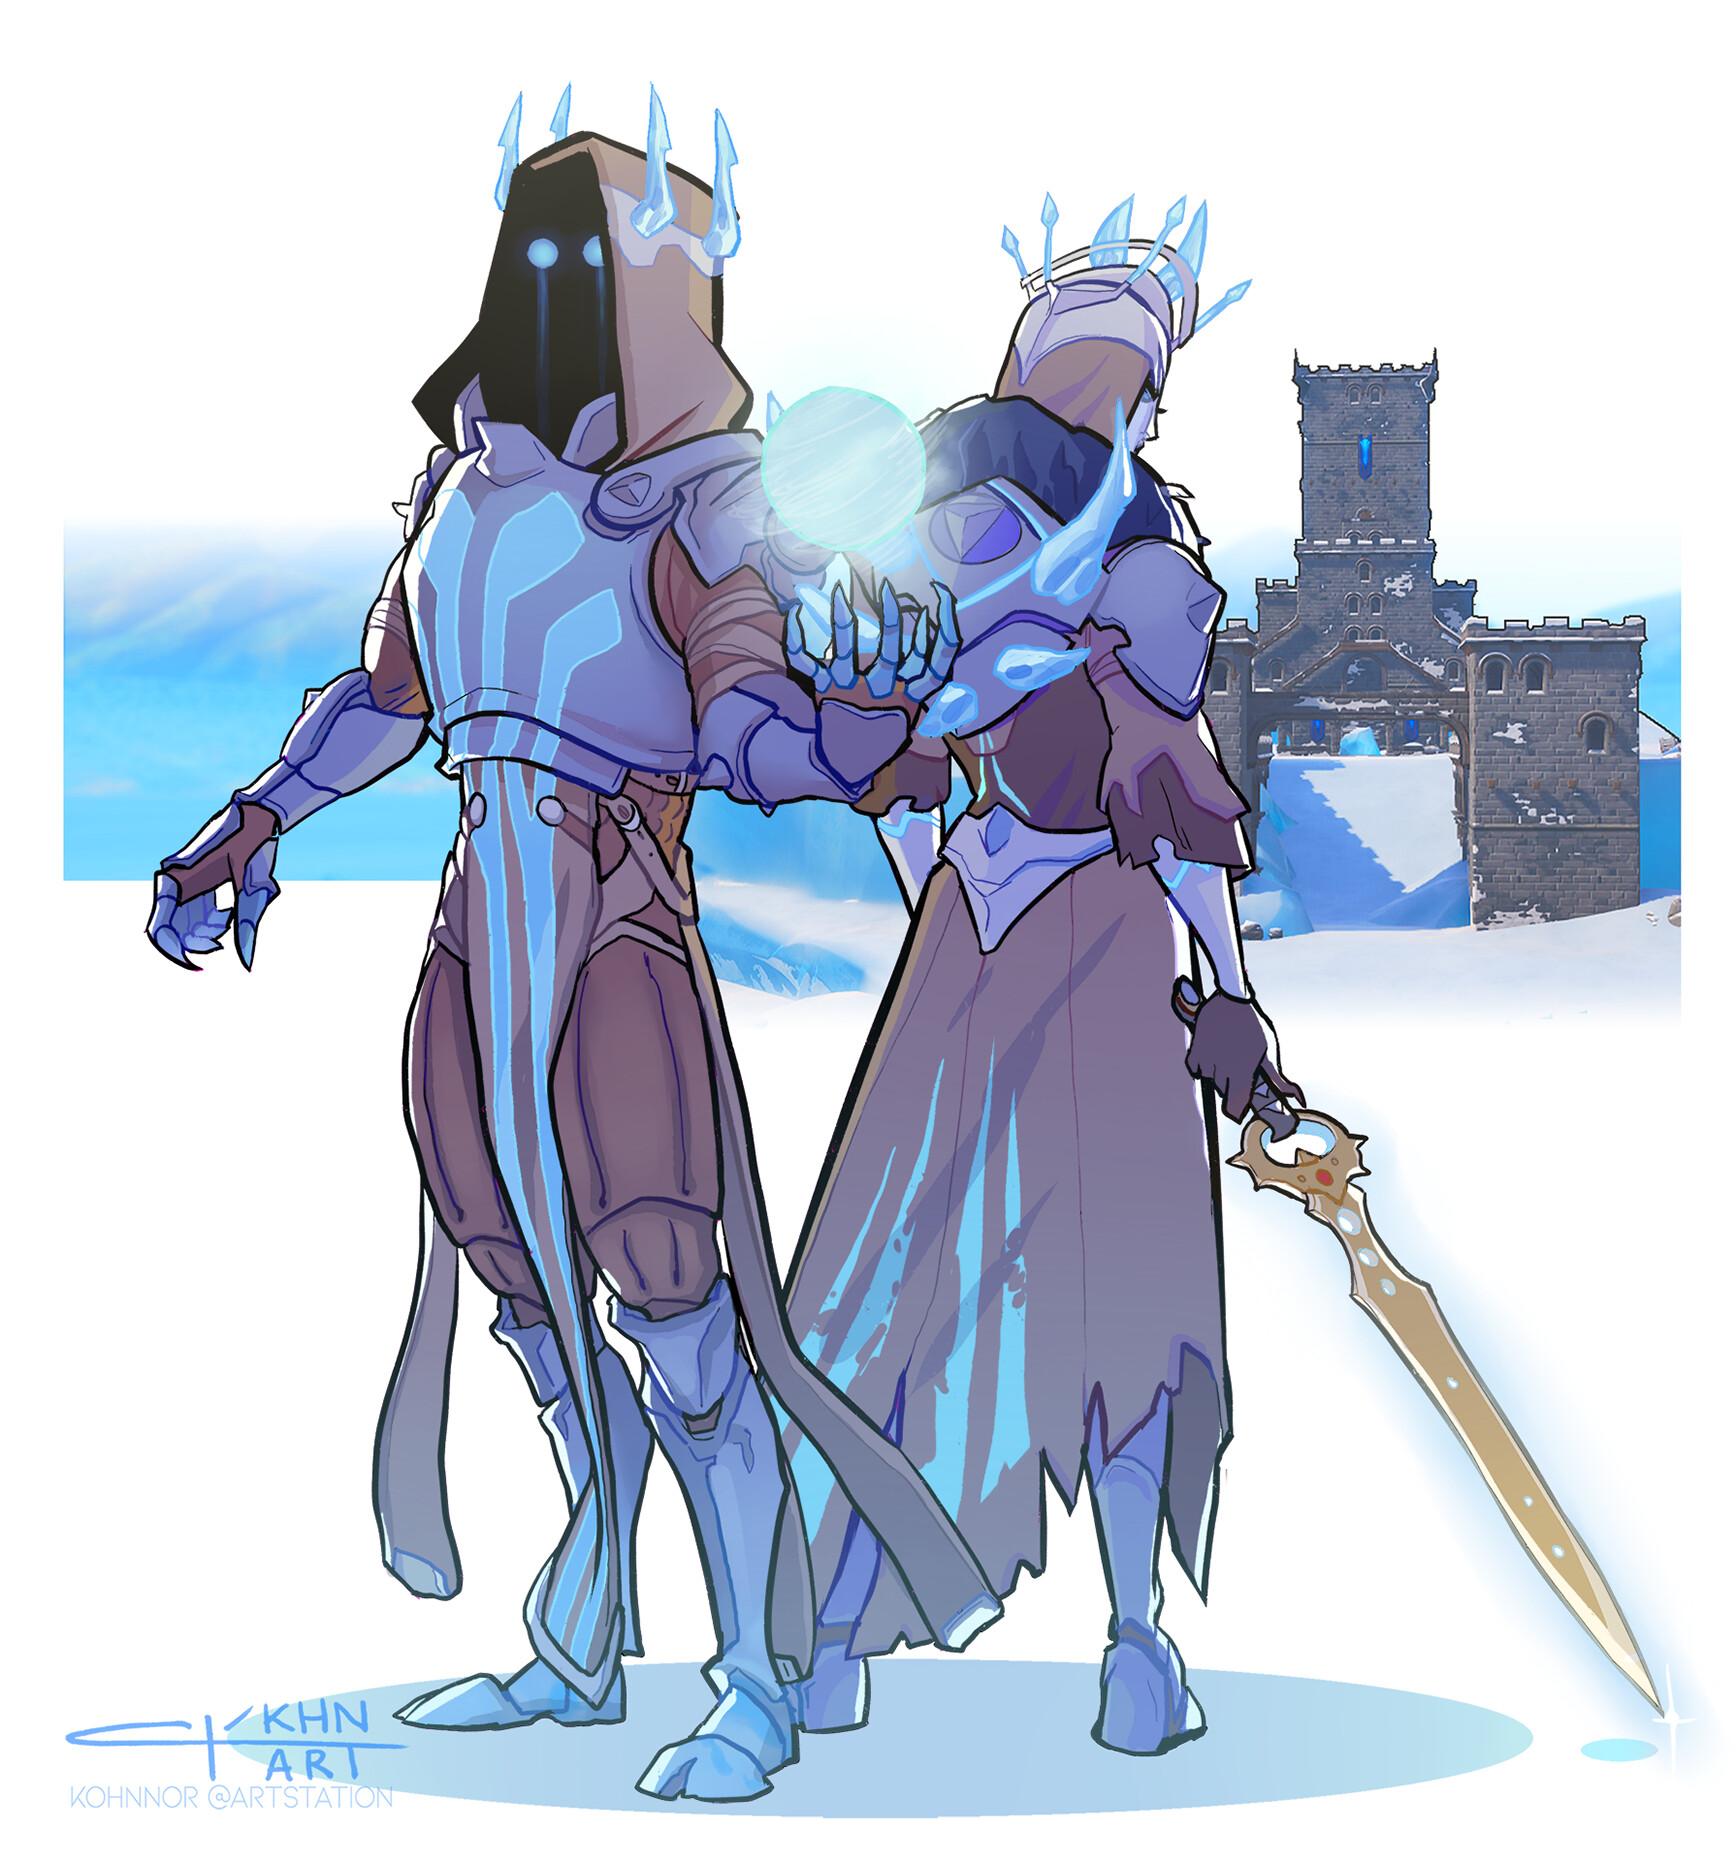 [38+] Fortnite Ice King Wallpapers On WallpaperSafari